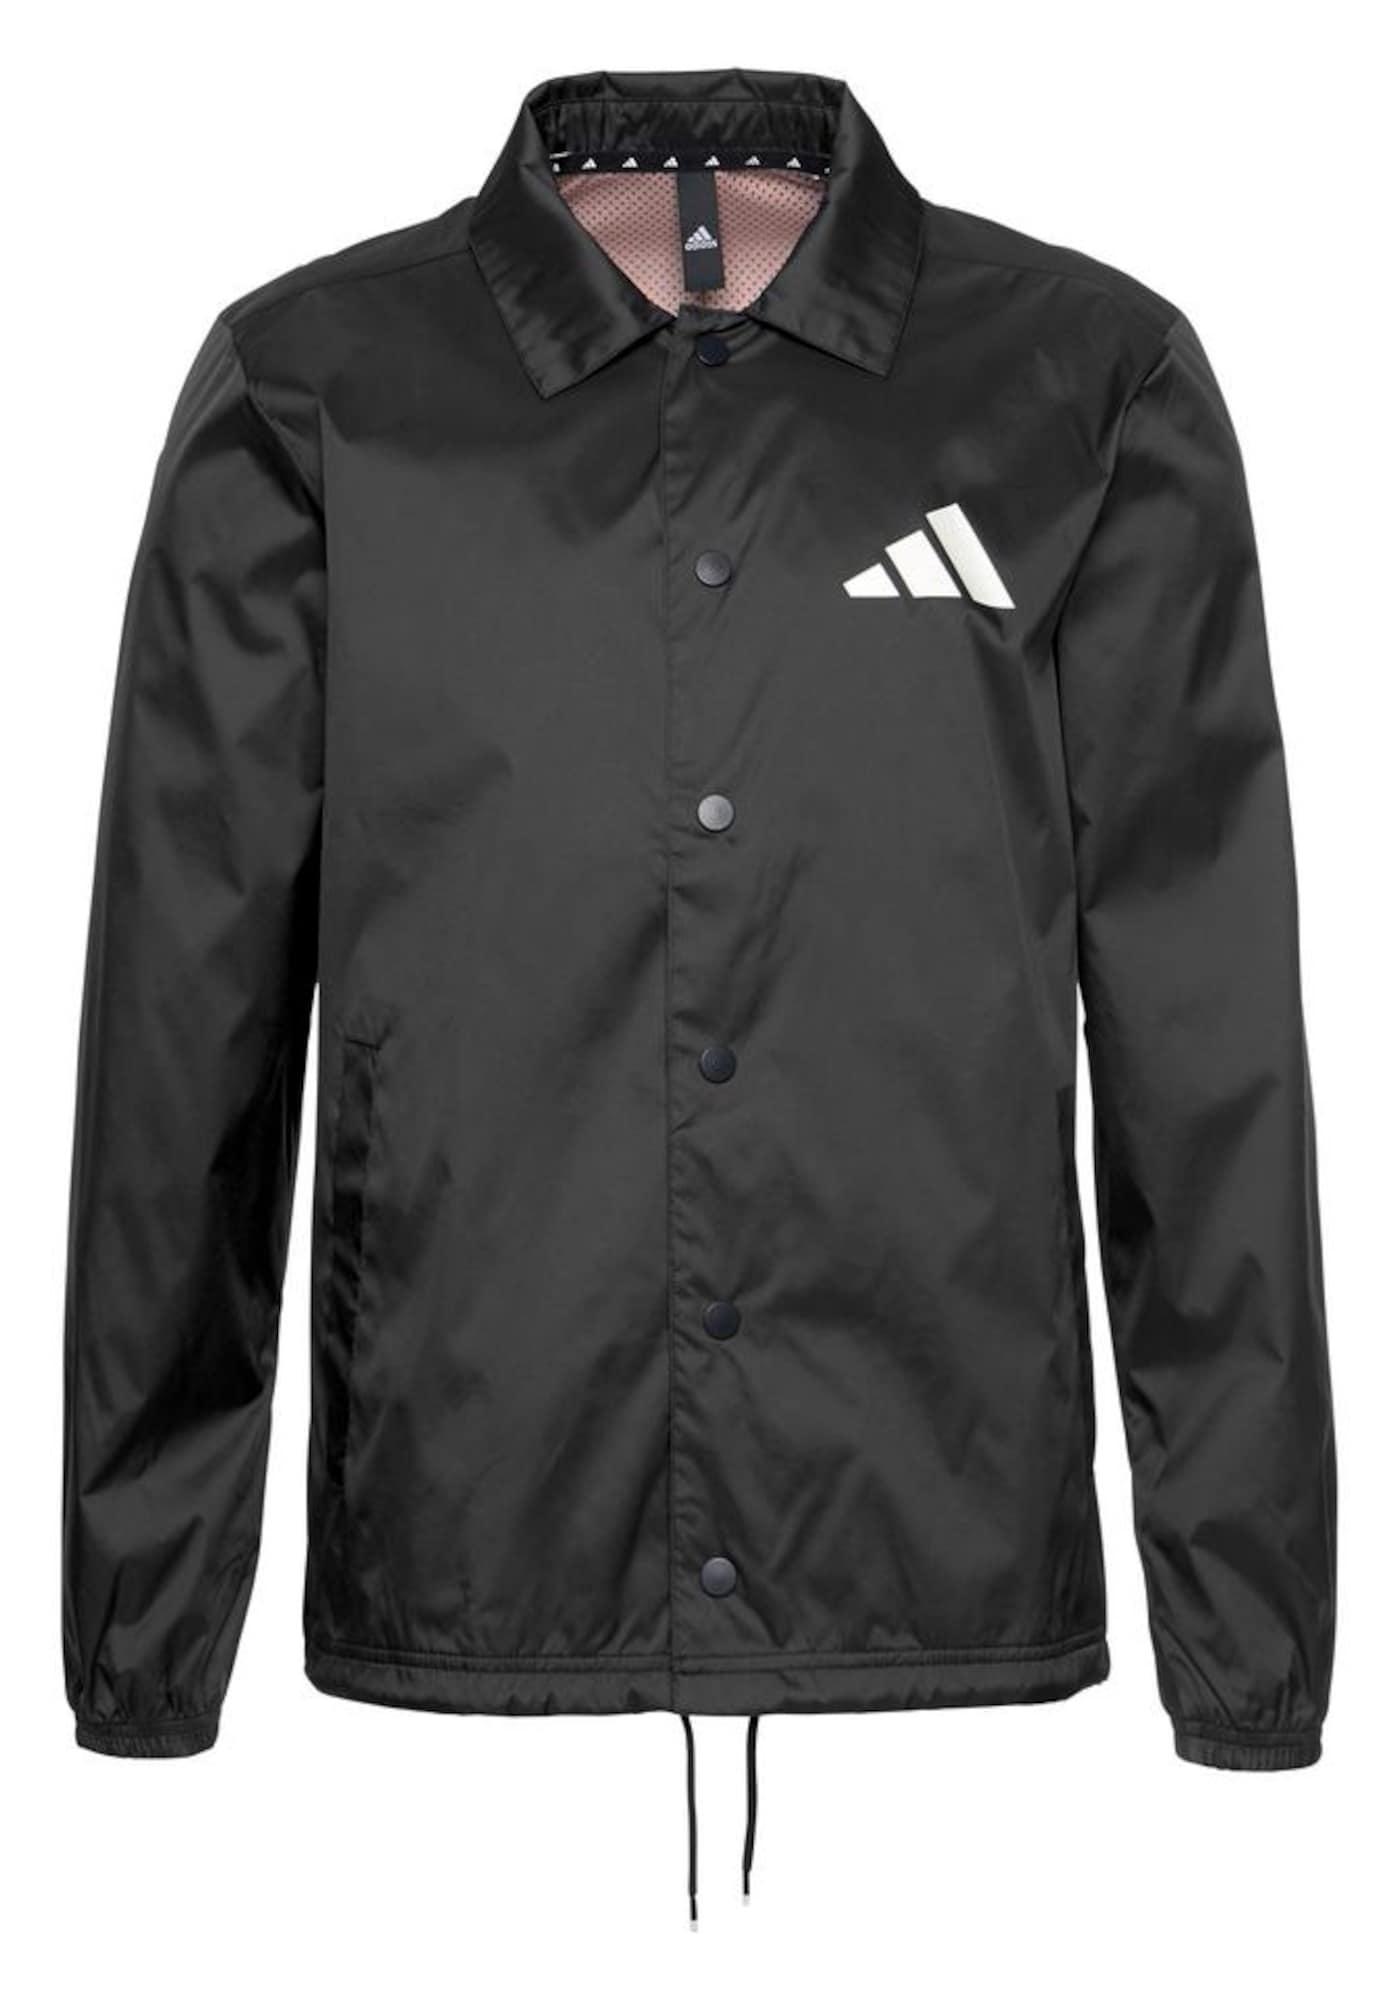 Windbreaker 'The Pack Coaches' | Sportbekleidung > Sportjacken > Windbreaker | ADIDAS PERFORMANCE